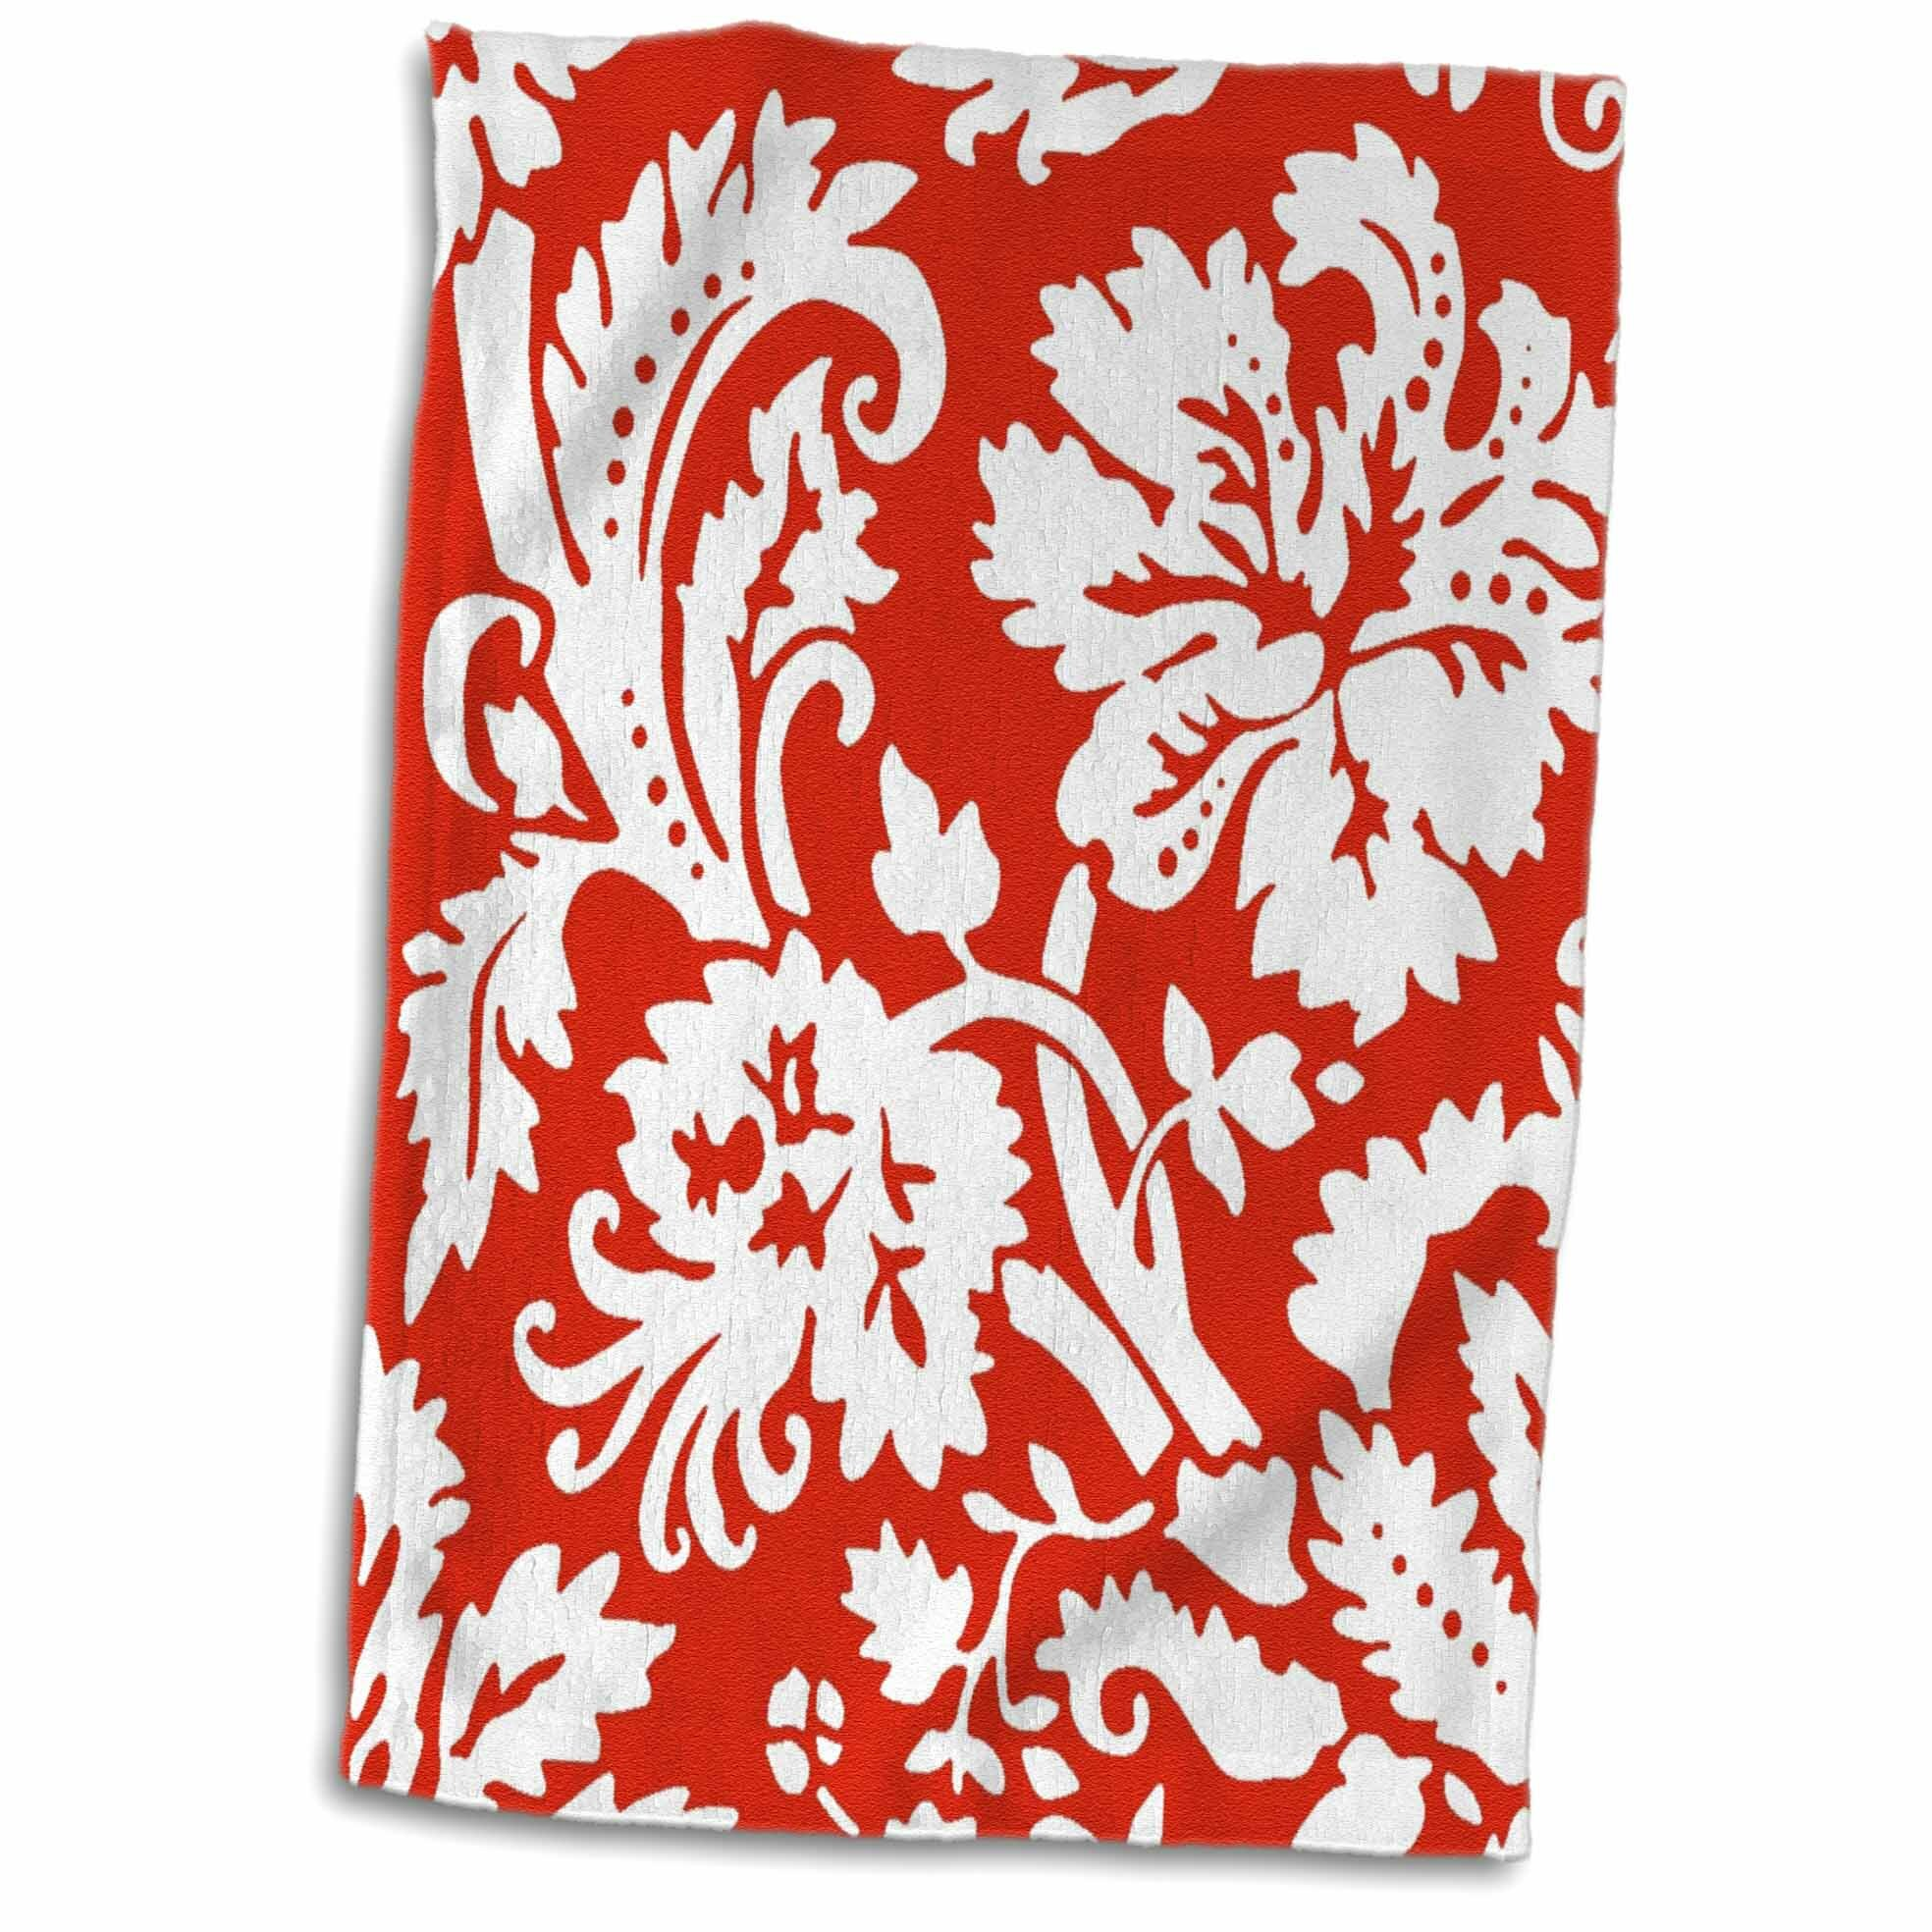 Symple Stuff Kearse Bold Damask Patternstylish Modern Trendy Bright Swirls Hawaiian Swirly Floral Hand Towel Wayfair